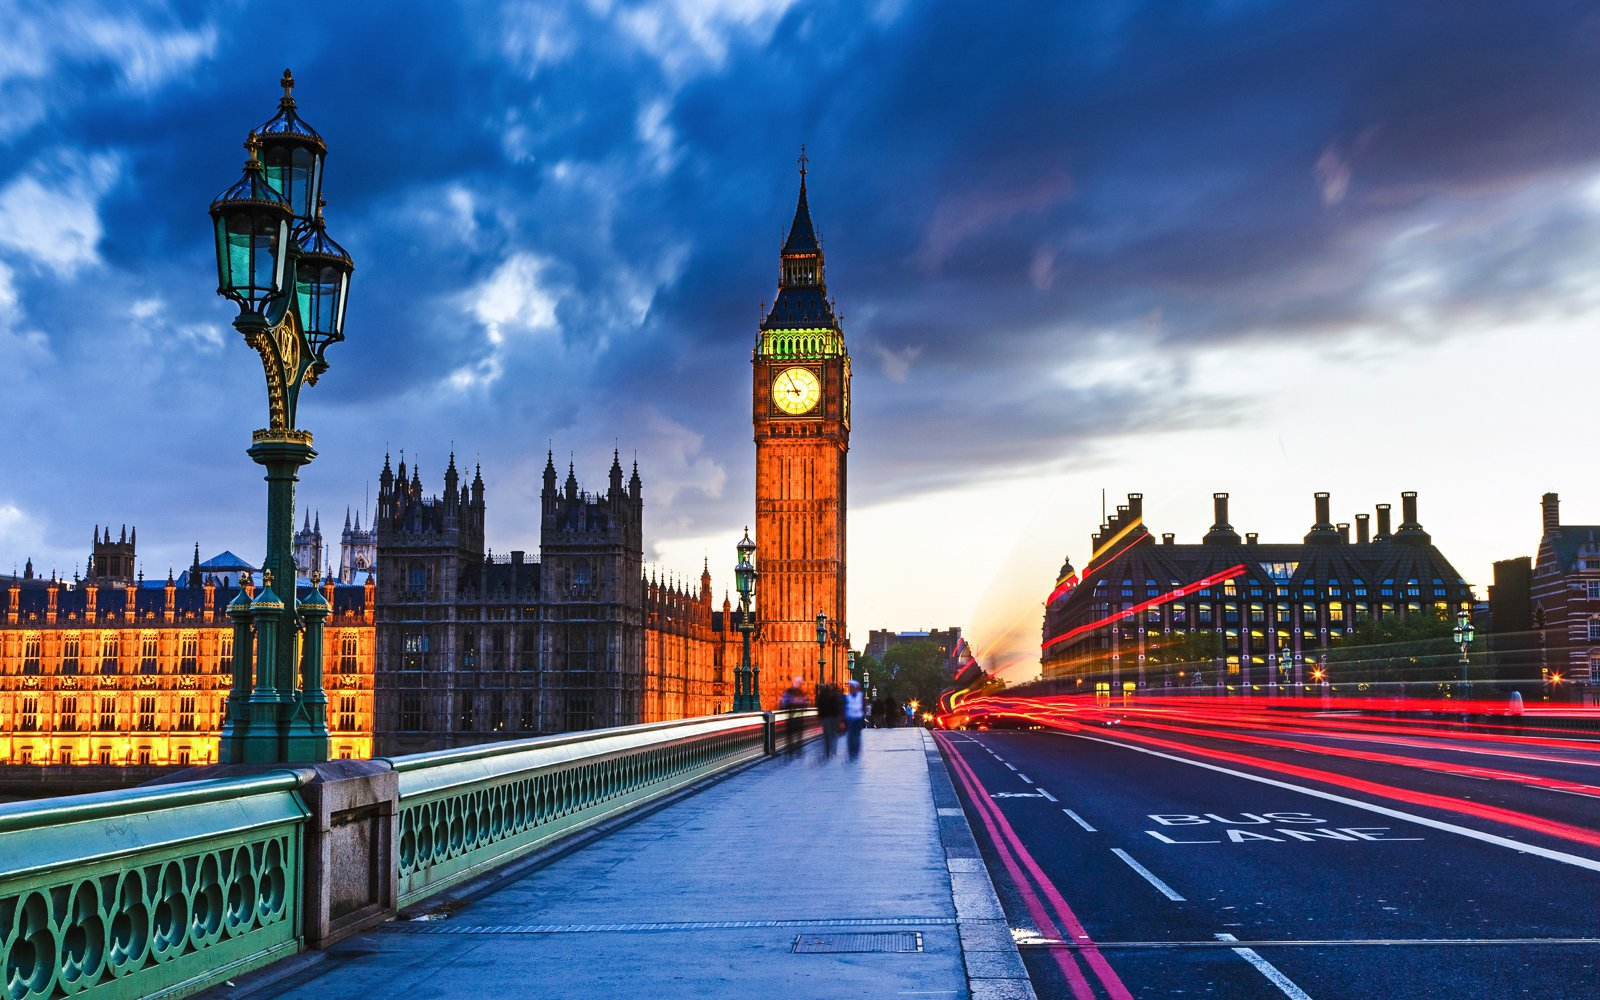 Nano (NANO) Updates: $6,350 Treasure Hunt in London and Amazing NANO Community Efforts 13